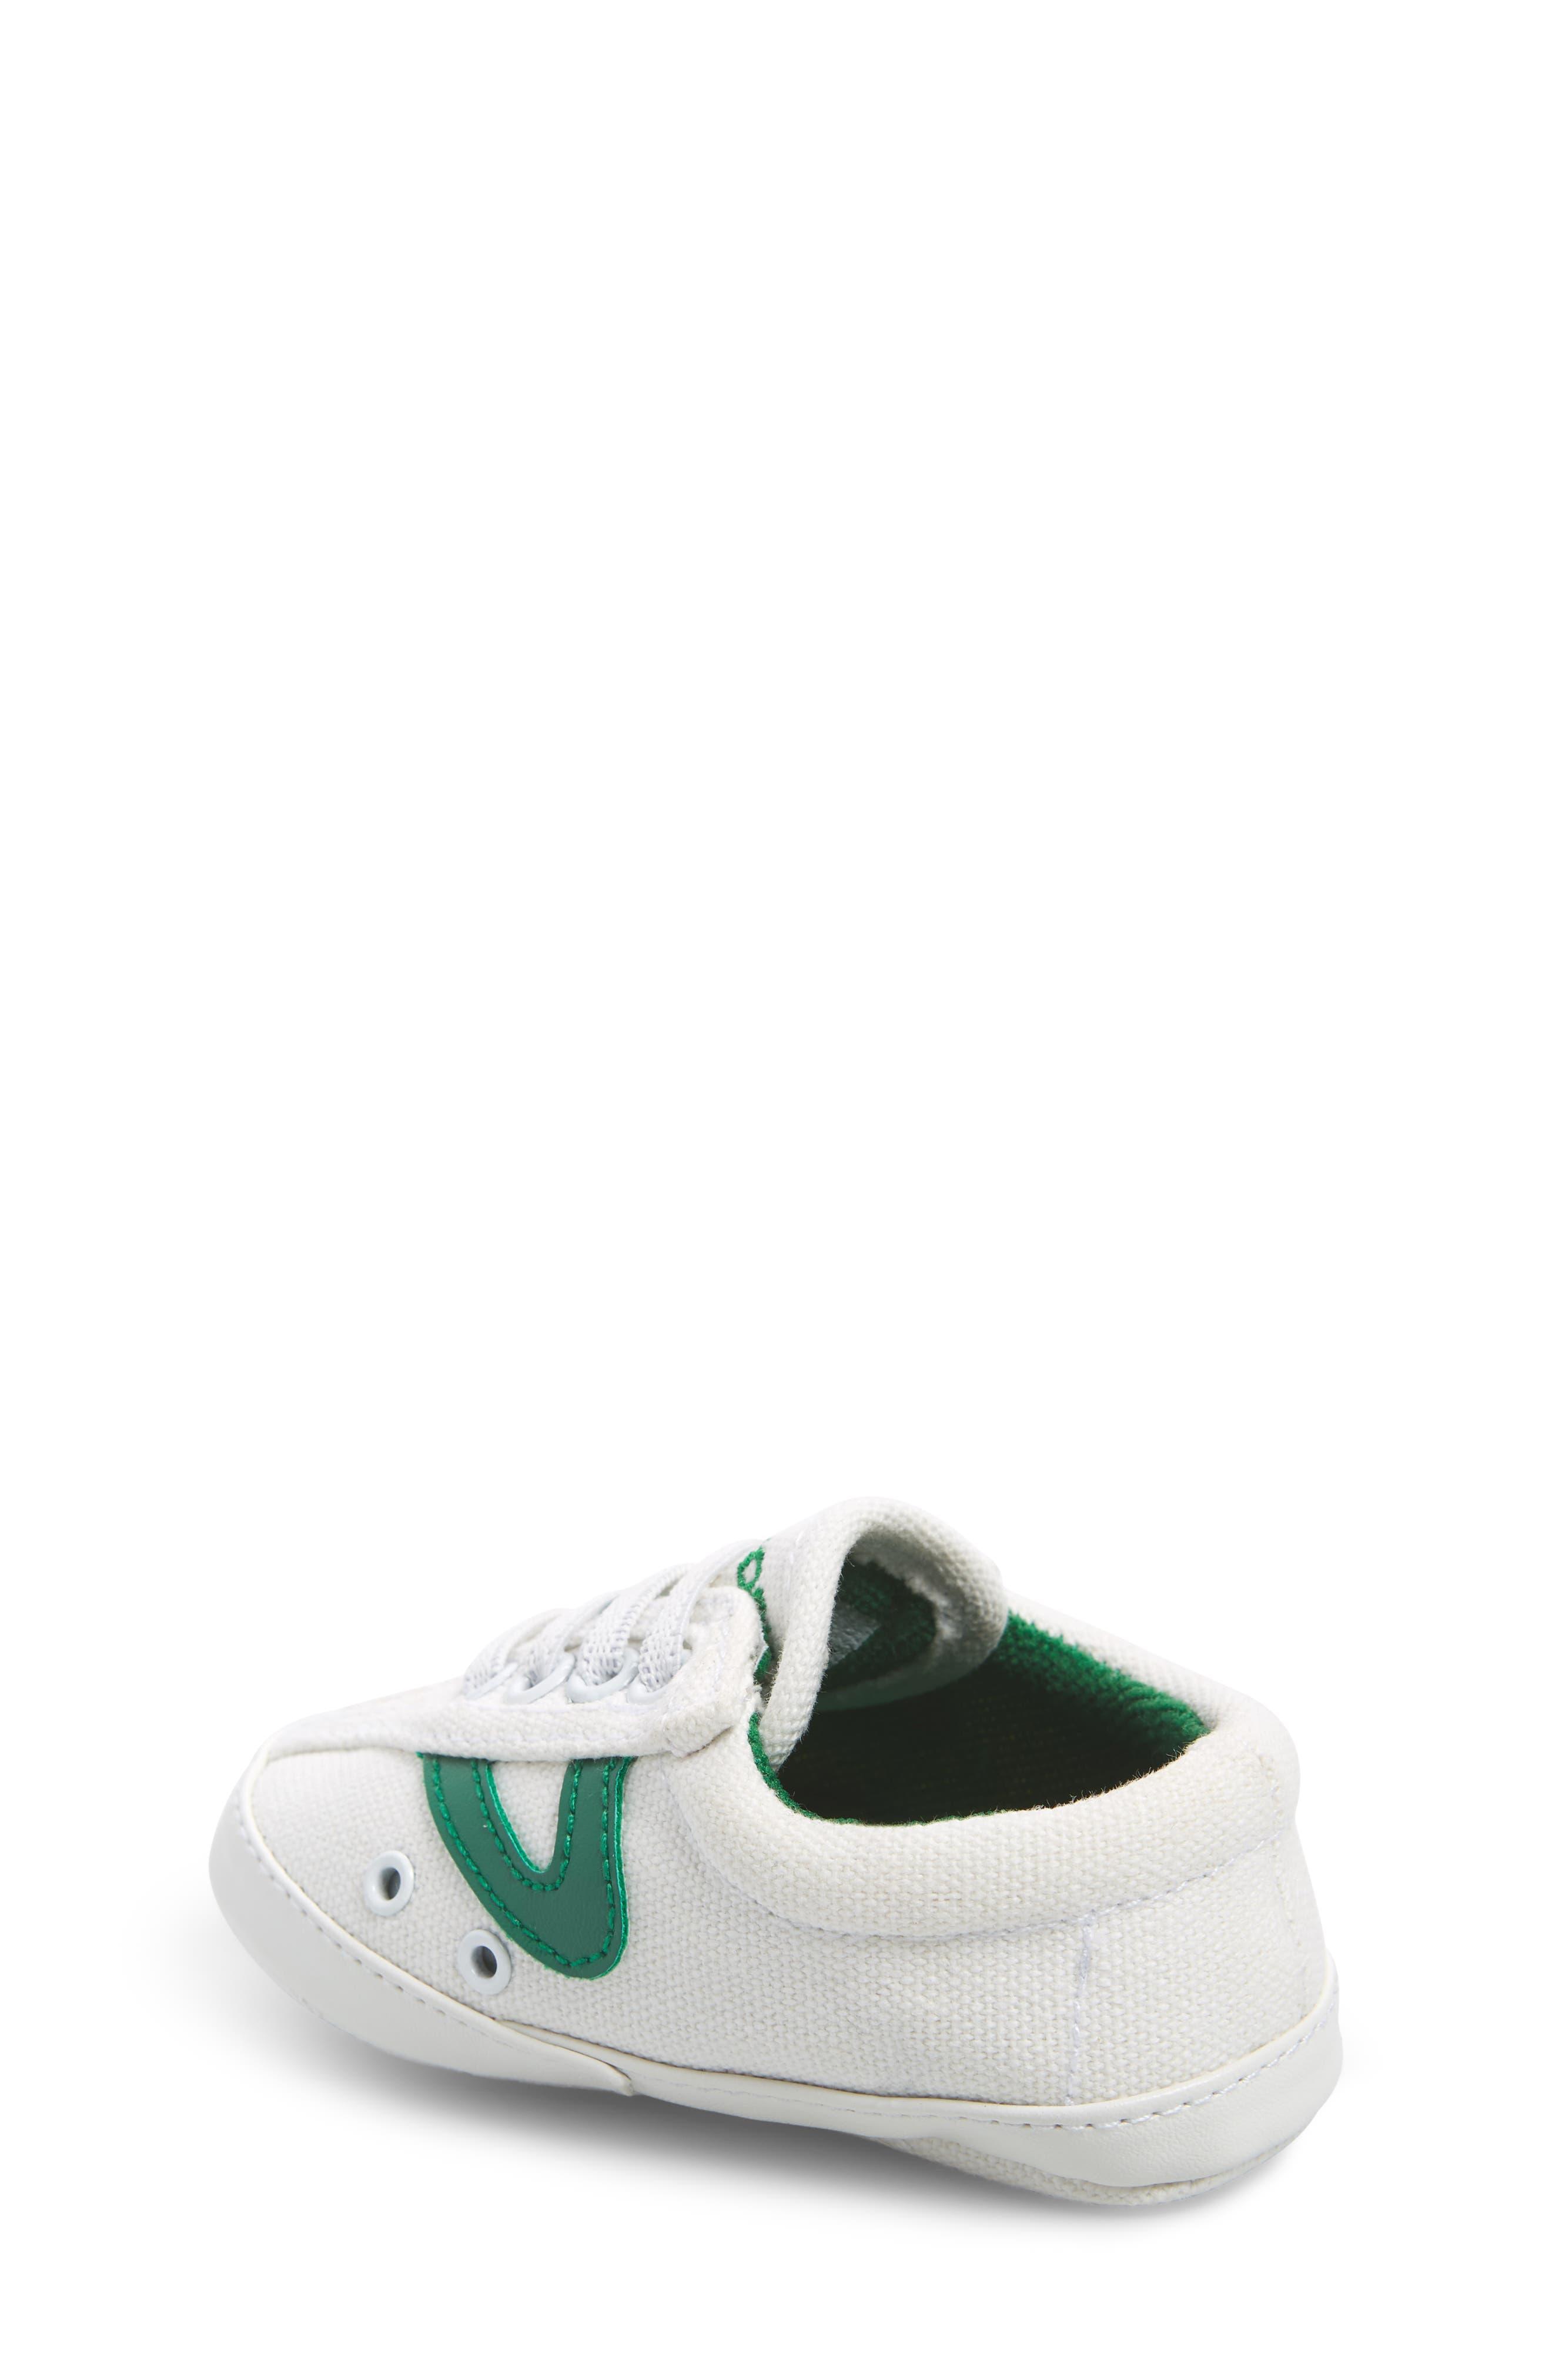 Nylite Plus Sneaker,                             Alternate thumbnail 2, color,                             White/ Green